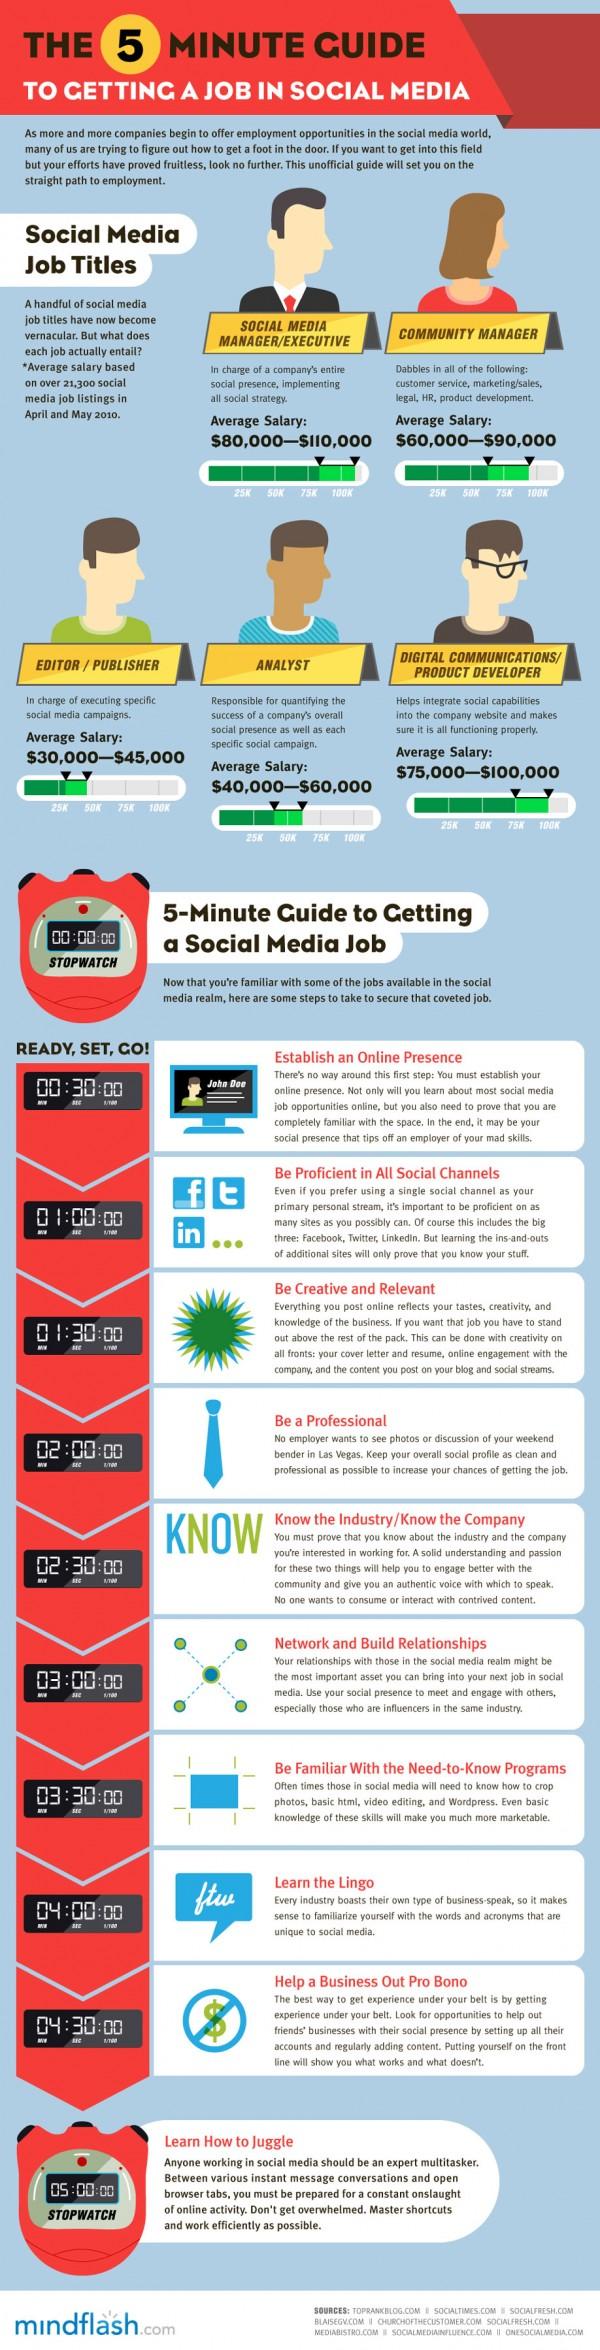 infographic-on-social-media-08